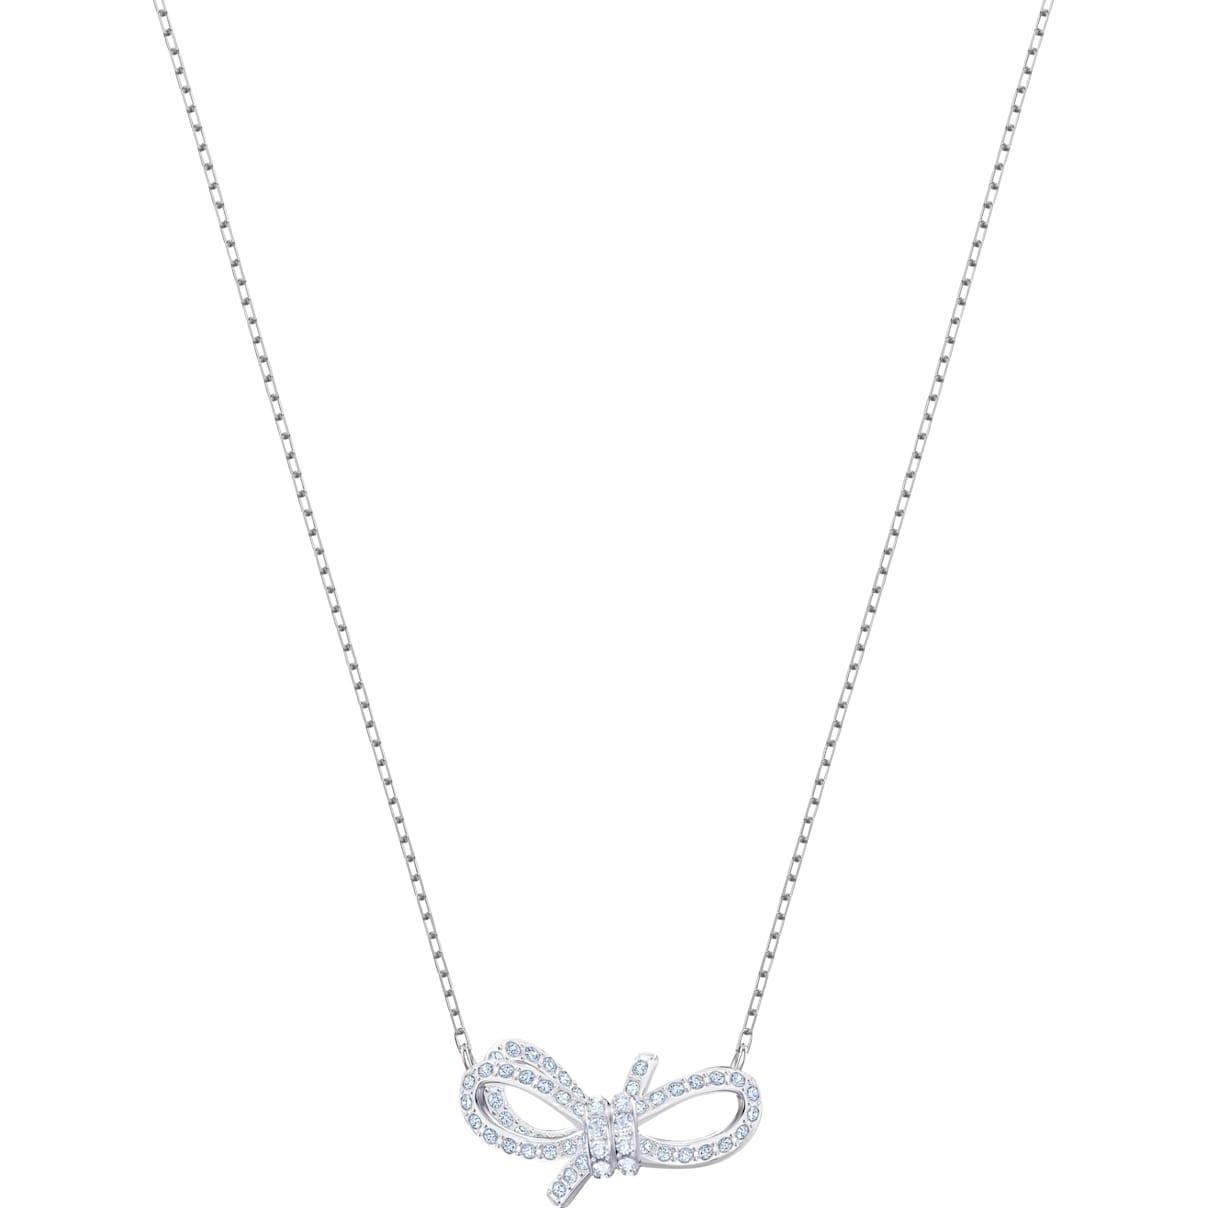 Swarovski Lifelong Bow Necklace, White, Rhodium plated